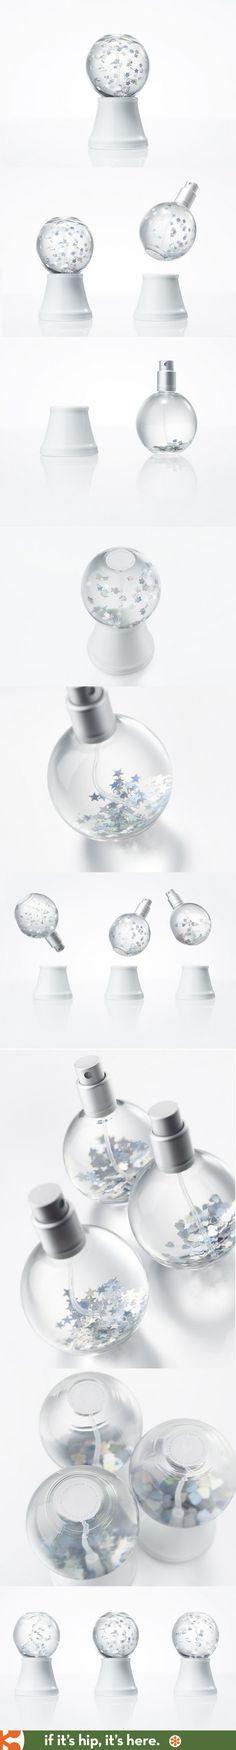 Nendo's cleverly designed Snow Globe perfumes.